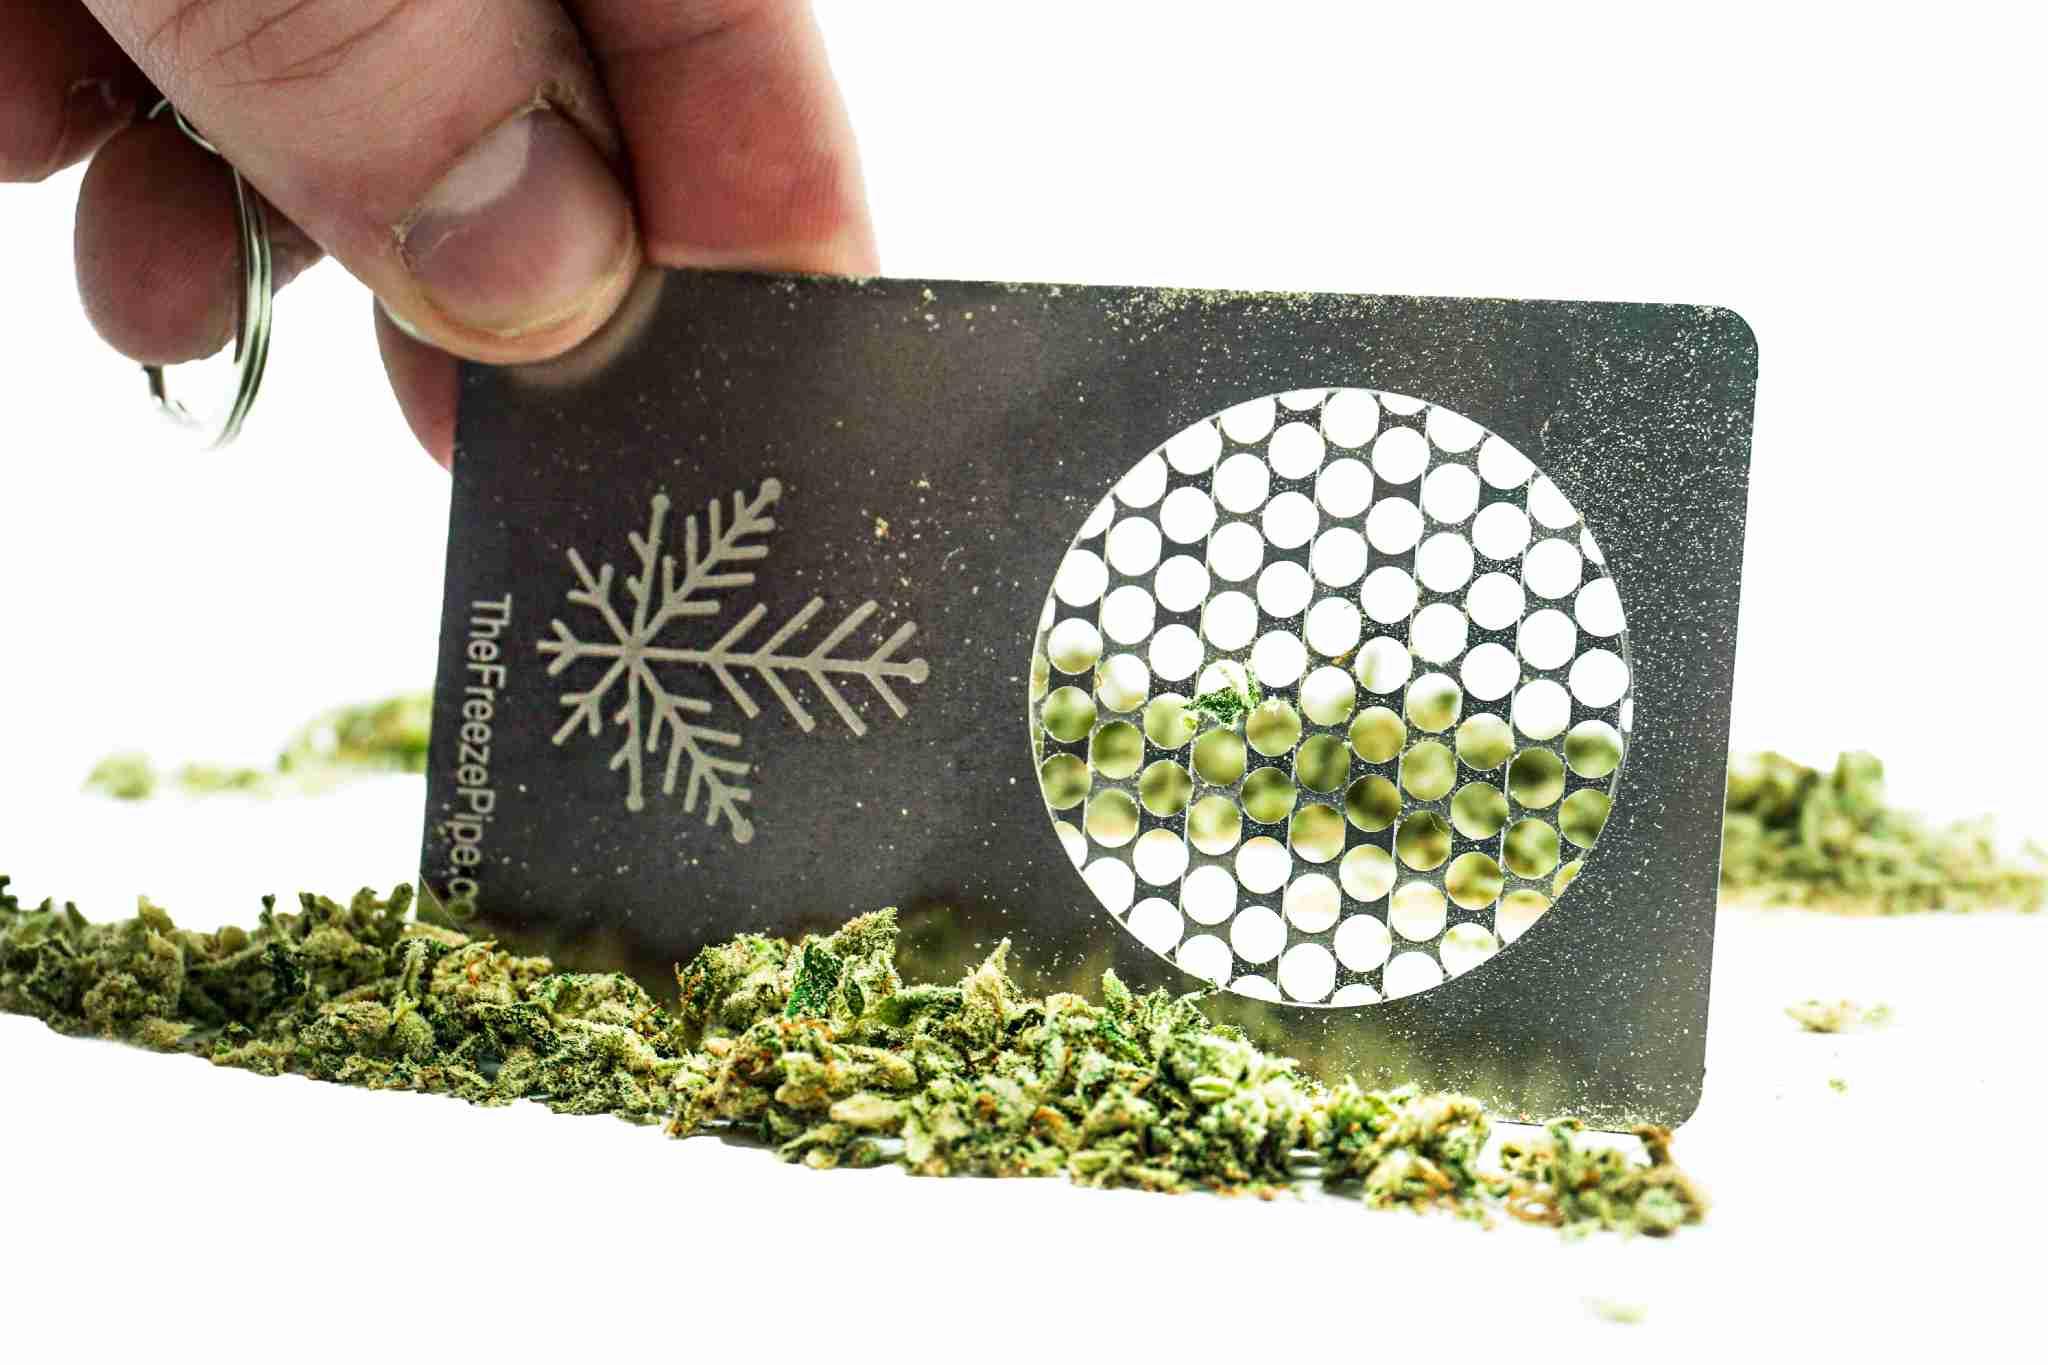 keychain weed card grinder